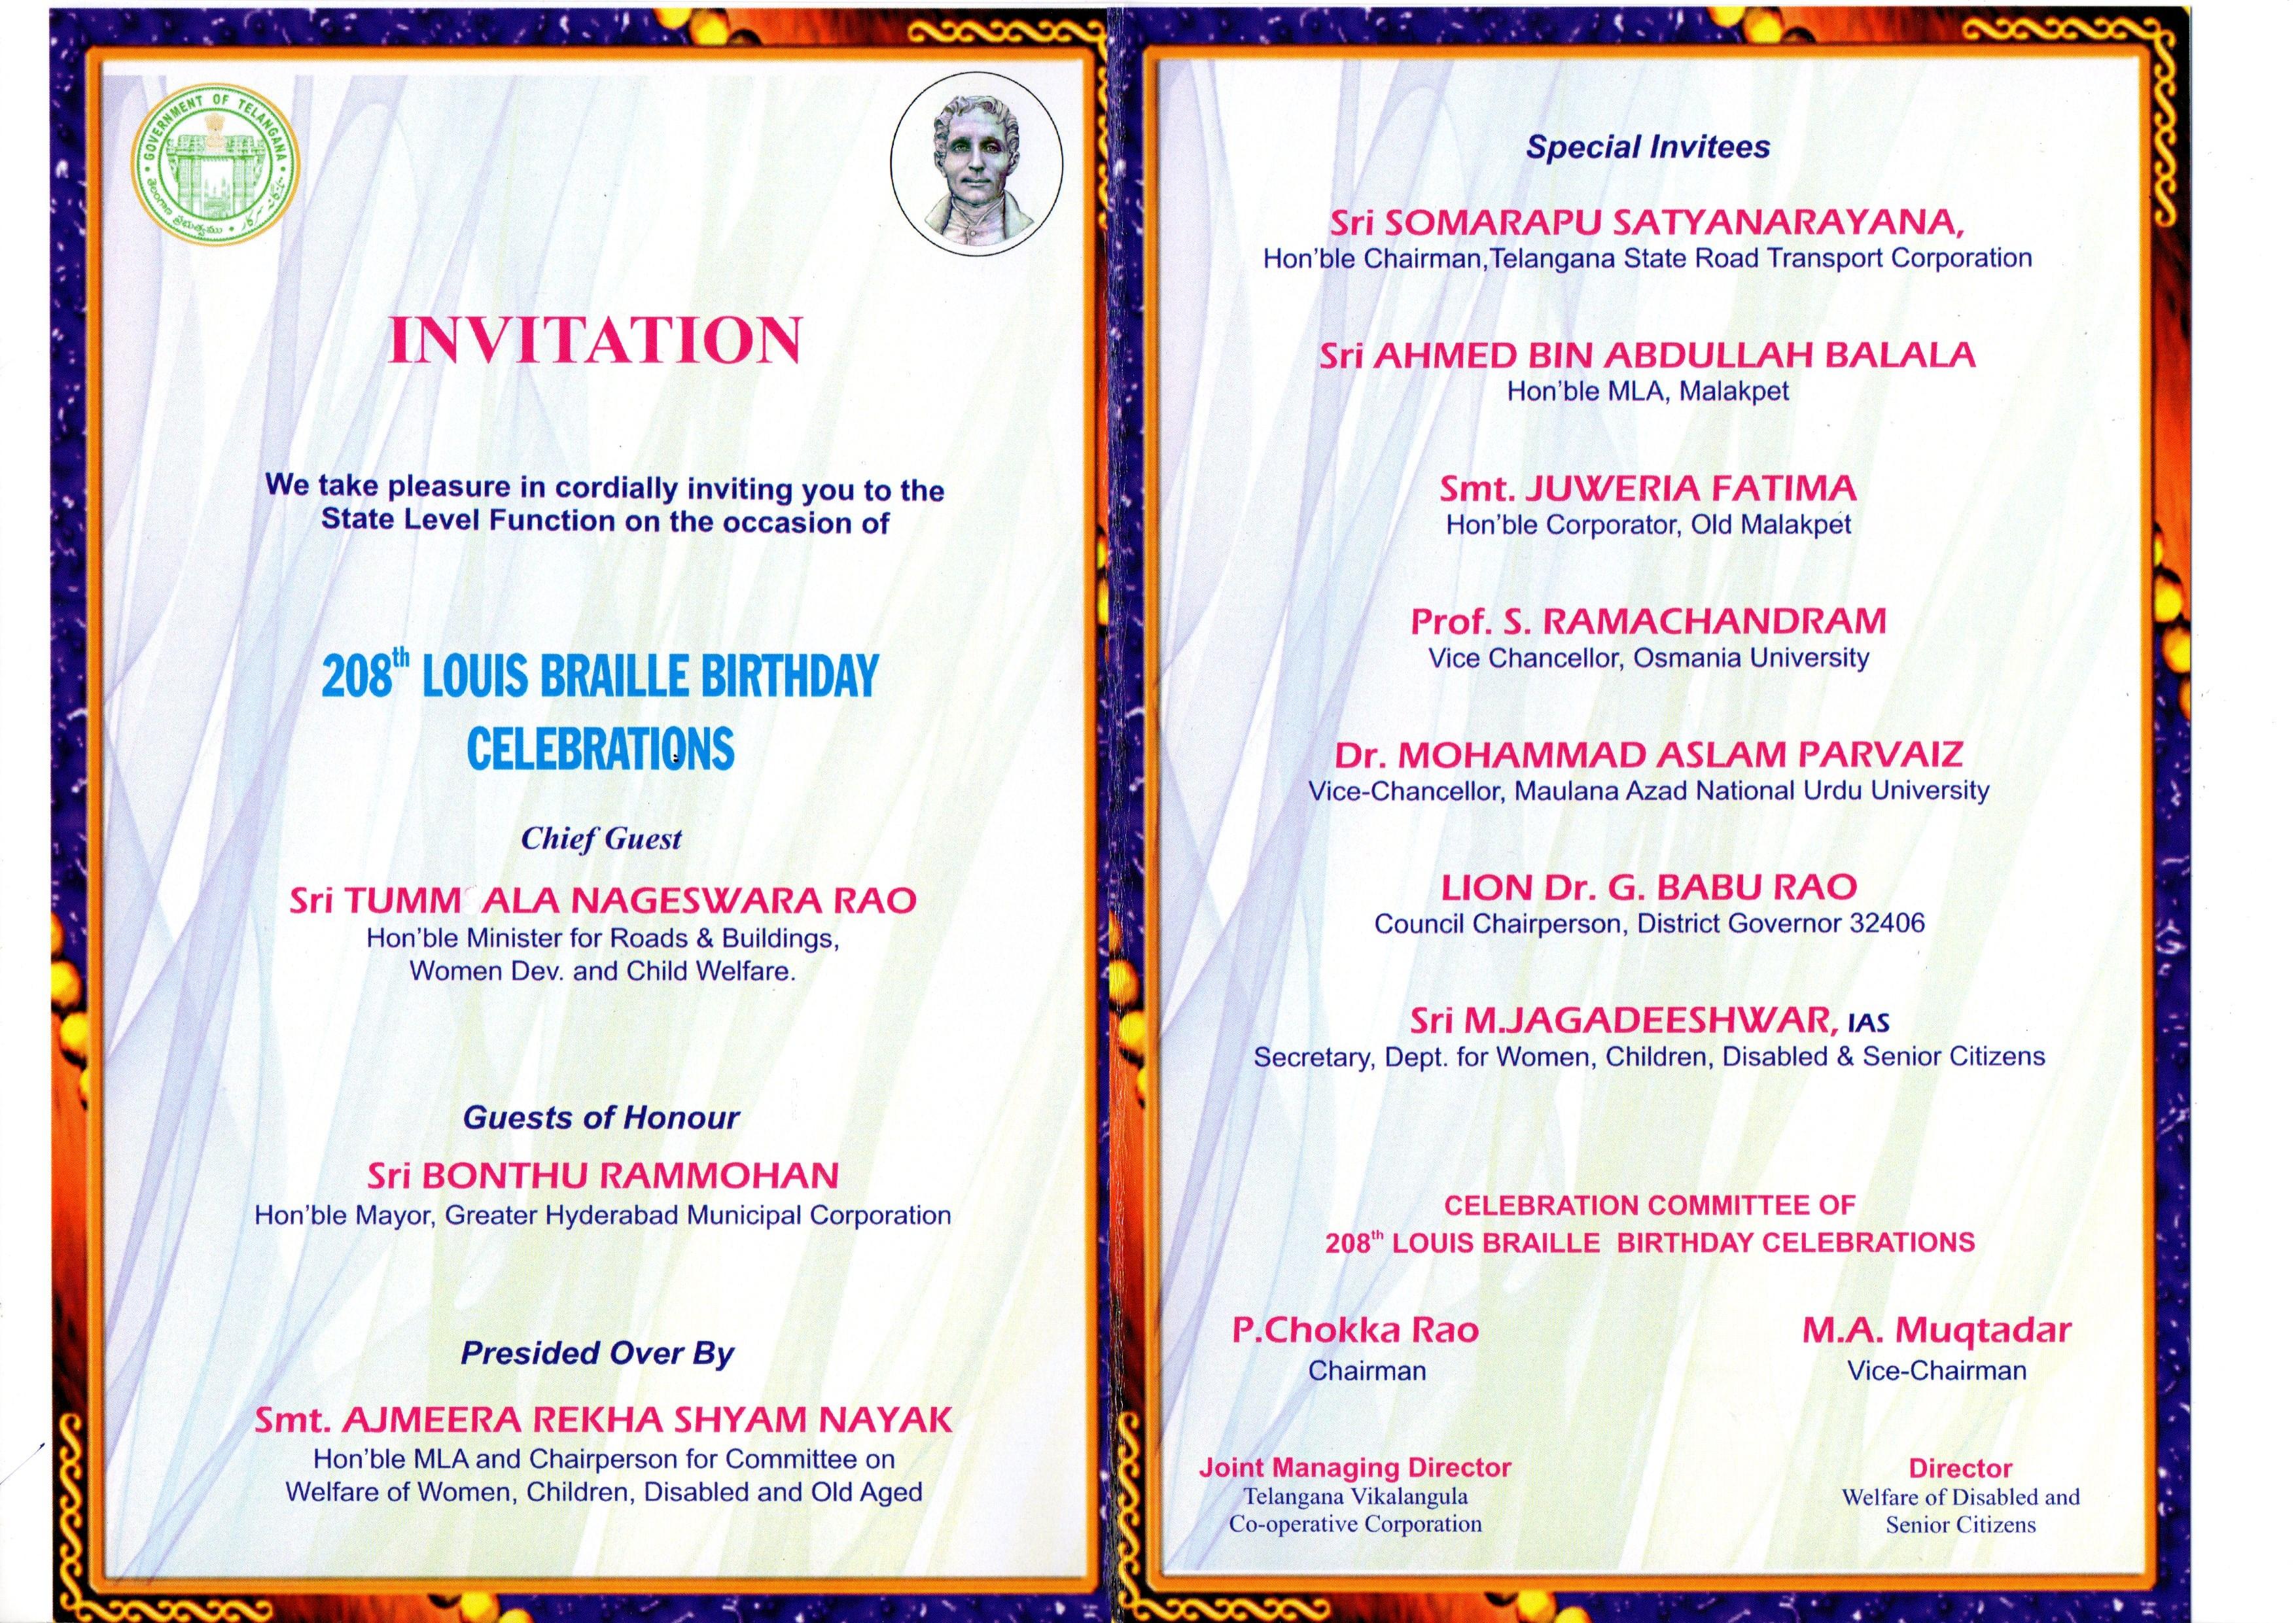 Louis braille 208th birthday celebrations invitation invitation hyd1 stopboris Choice Image